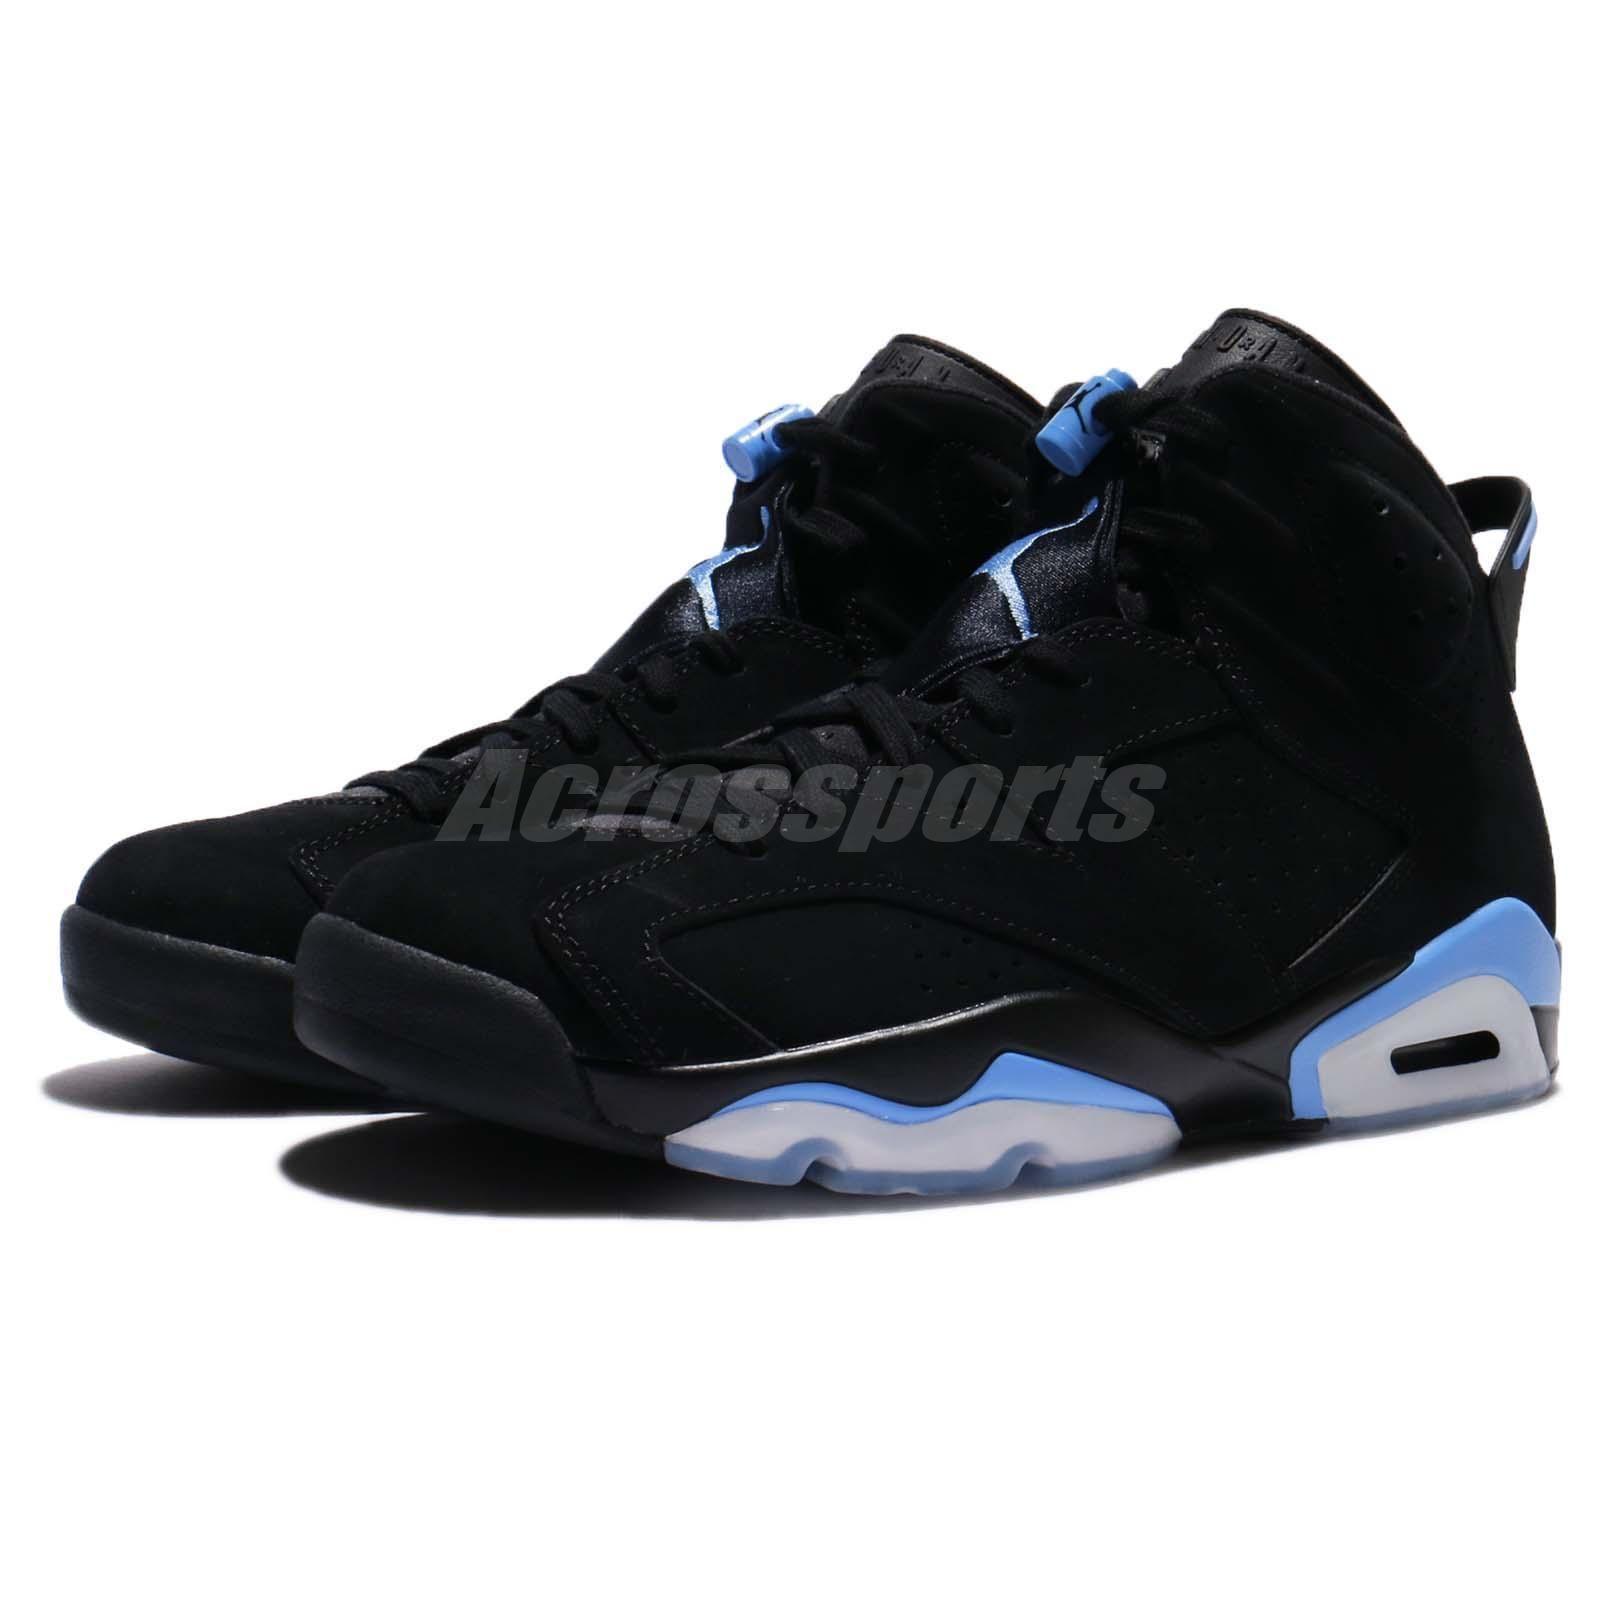 Nike Air Jordan 6 Retro Vi Unc University Blue Black Aj6 Shoes Men 384664 006 S N A 384664006 Color A Bla Nike Air Jordan 6 Air Jordans Nike Air Jordan Retro